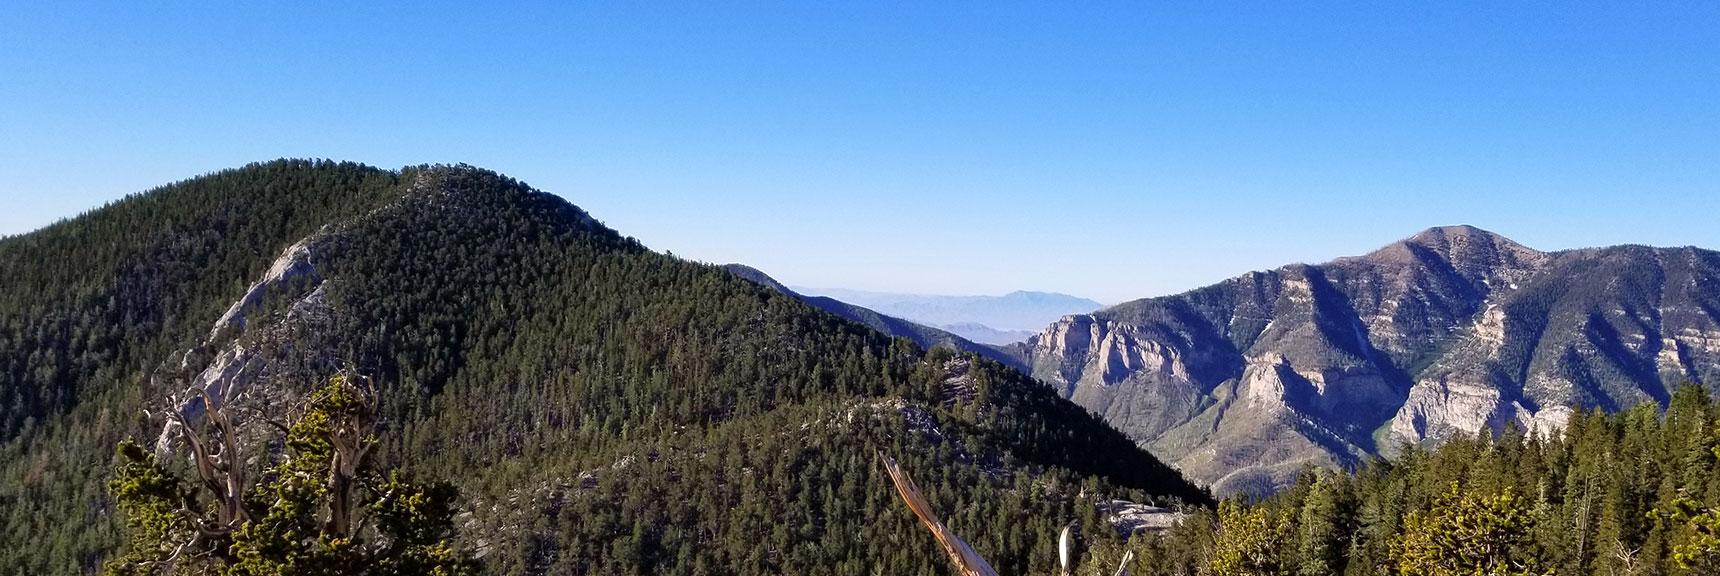 Fletcher Peak from Ridge Over North Loop Trail, Griffith Peak in Background